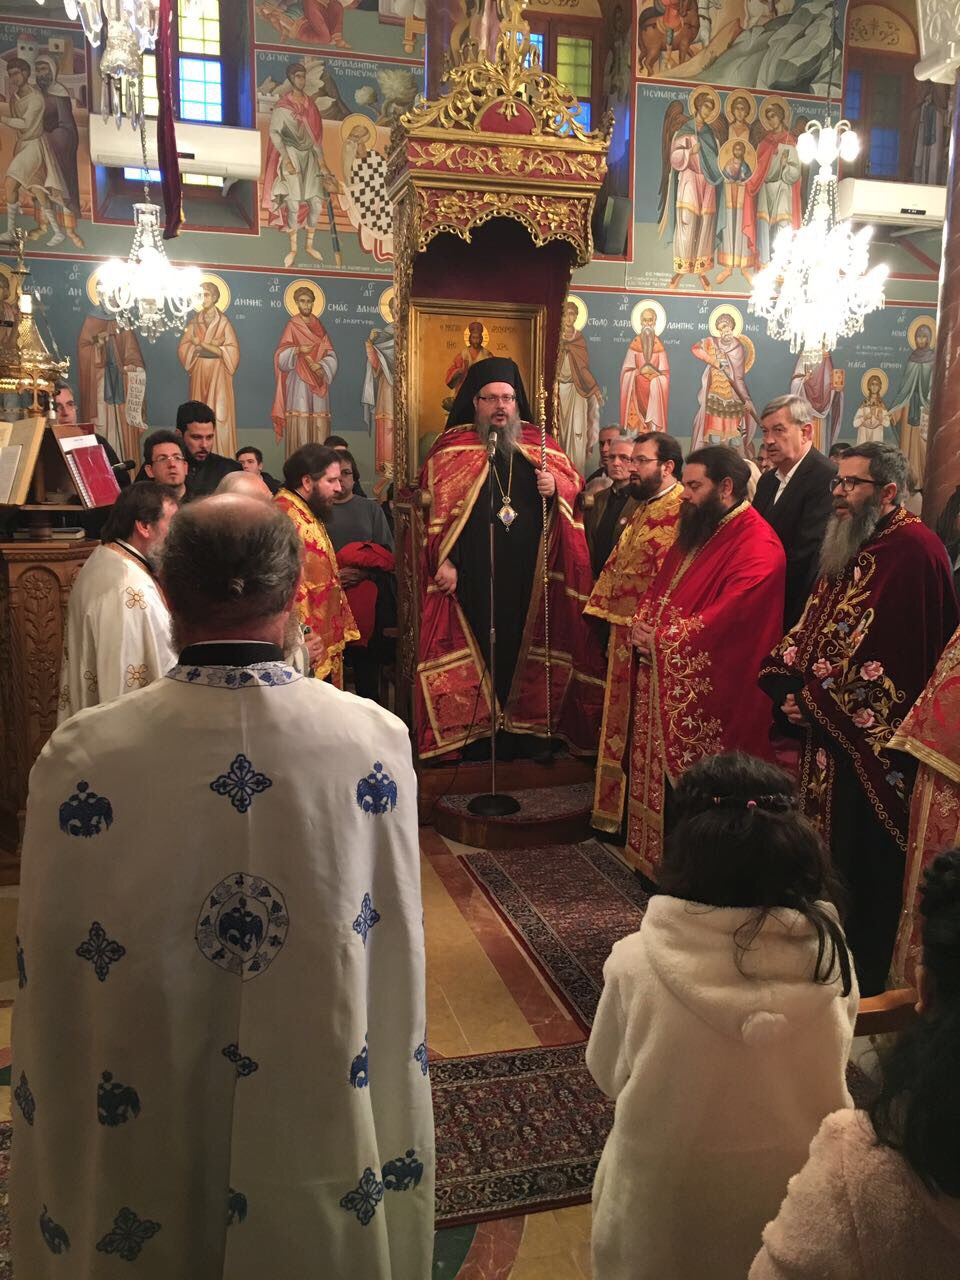 AgXaralampos Nikaia 2019 3 - Στον πανηγυρικό εσπερινό του Αγίου Χαραλάμπους Νικαίας ο Σεβασμιώτατος